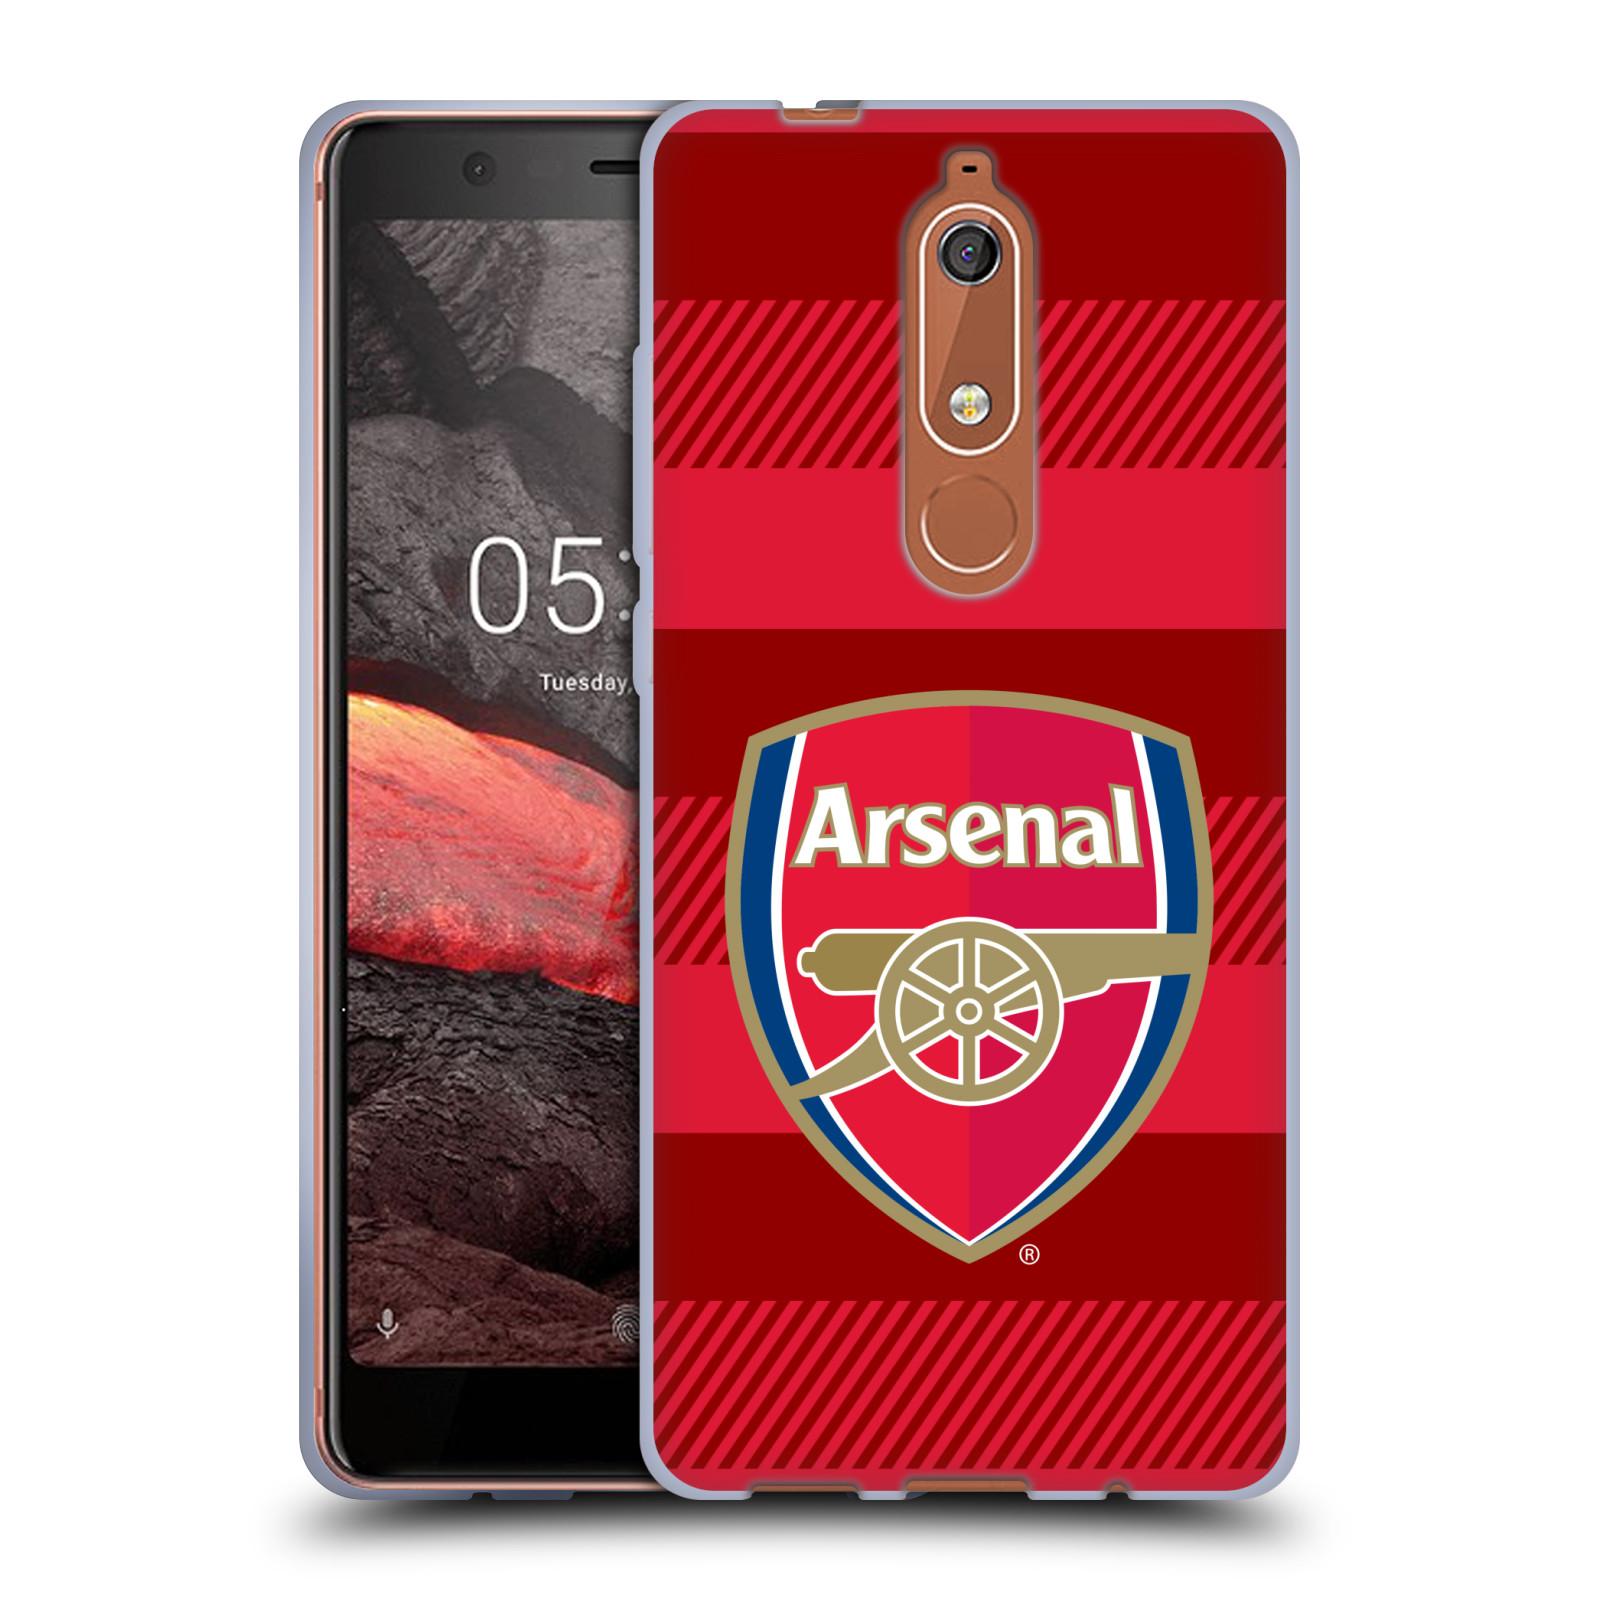 Silikonové pouzdro na mobil Nokia 5.1 - Head Case - Arsenal FC - Logo s pruhy